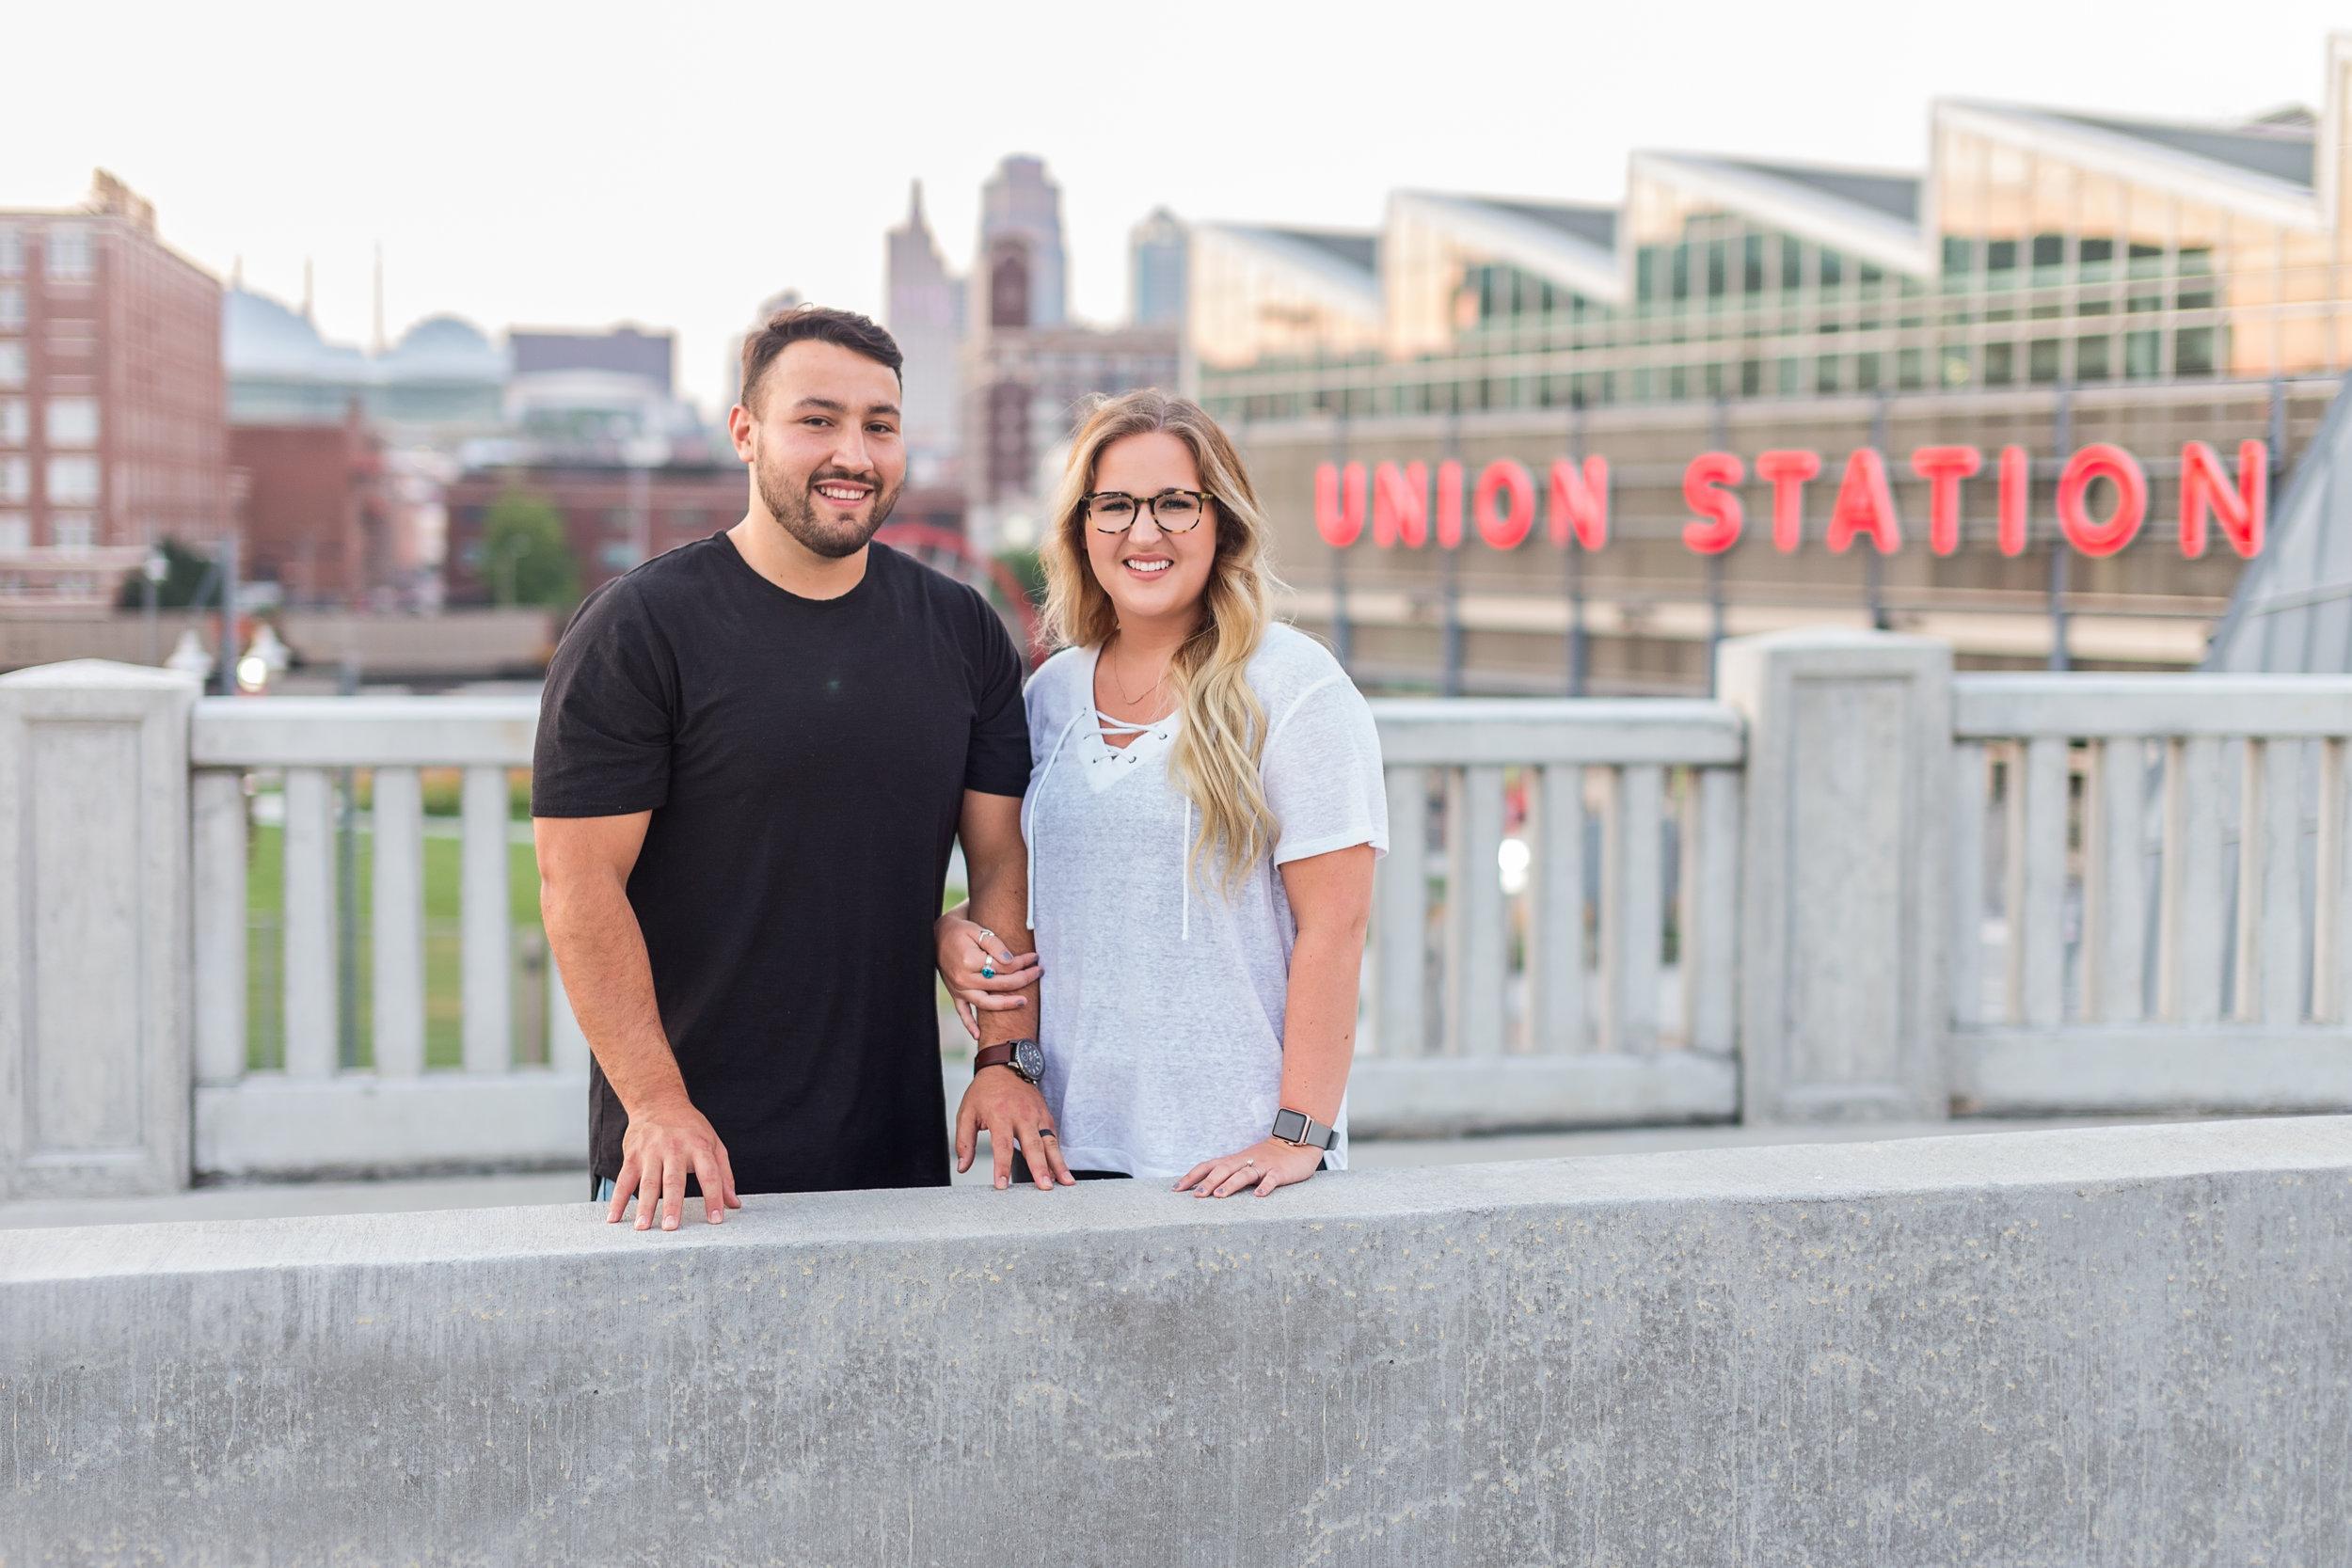 Kansas City Union Station Couple Photo Session